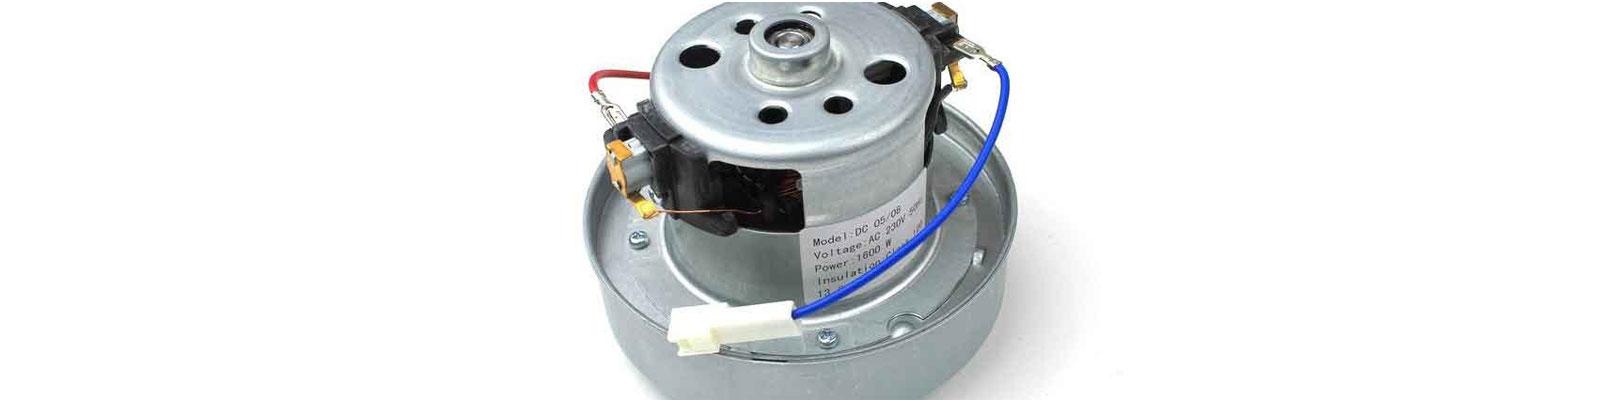 علت کاهش قدرت موتور جاروبرقی